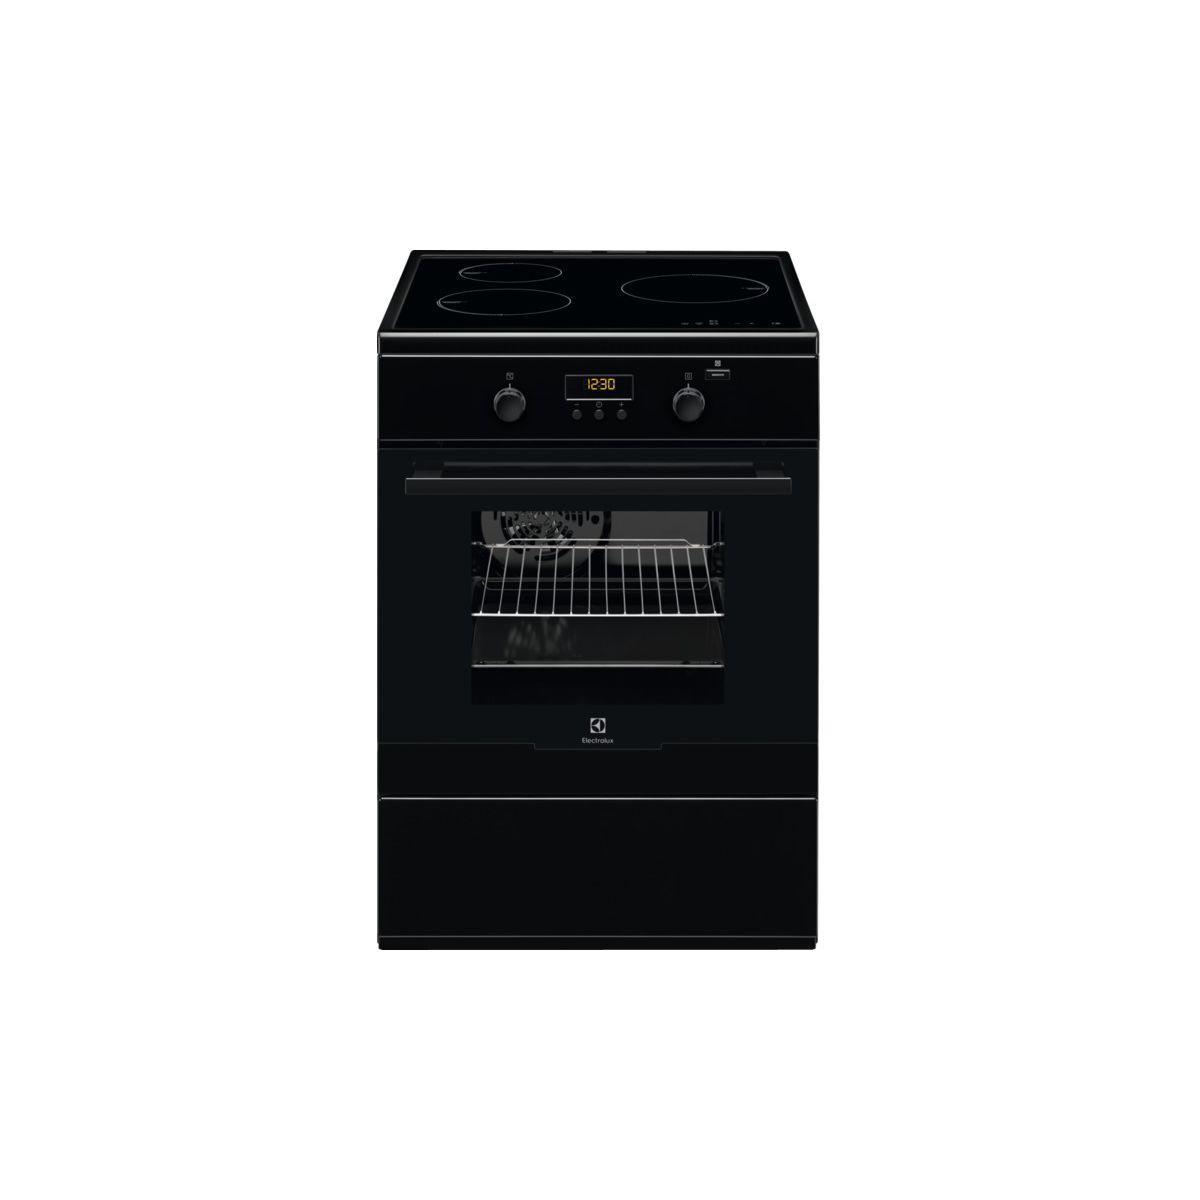 Cuisini�re induction electrolux eki64900ok - 15% de remise imm�diate avec le code : gam15 (photo)